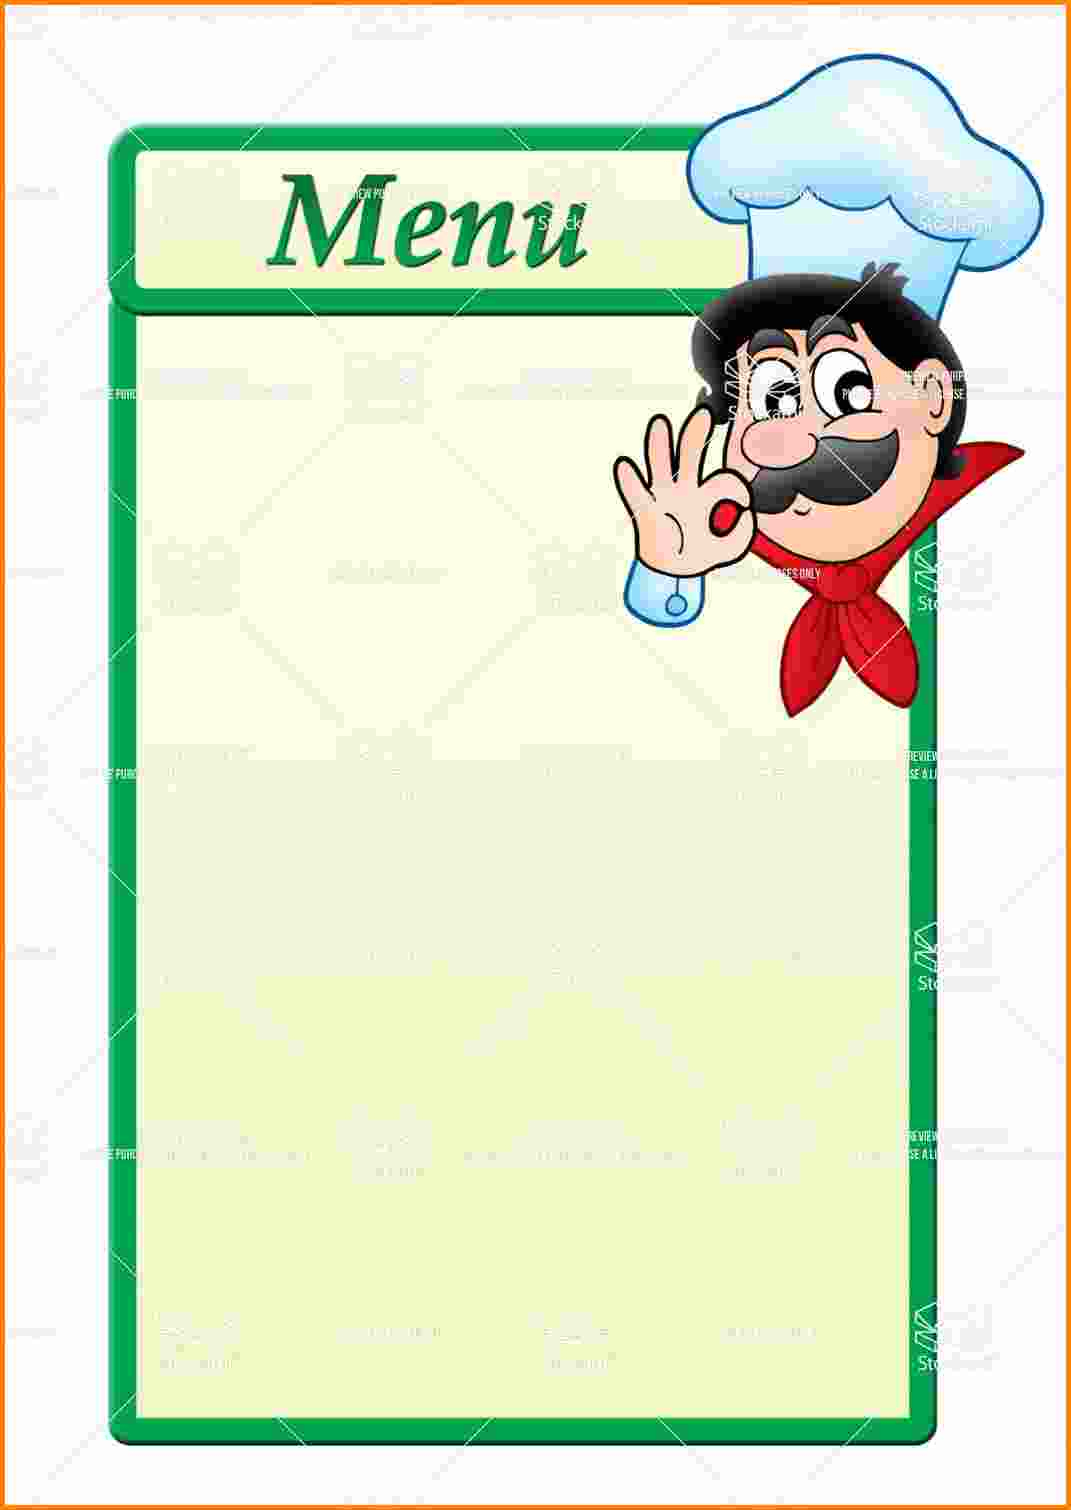 5 Excellent Free Restaurant Menu Plugins For WordPress Themegrill - Free Printable Menu Maker